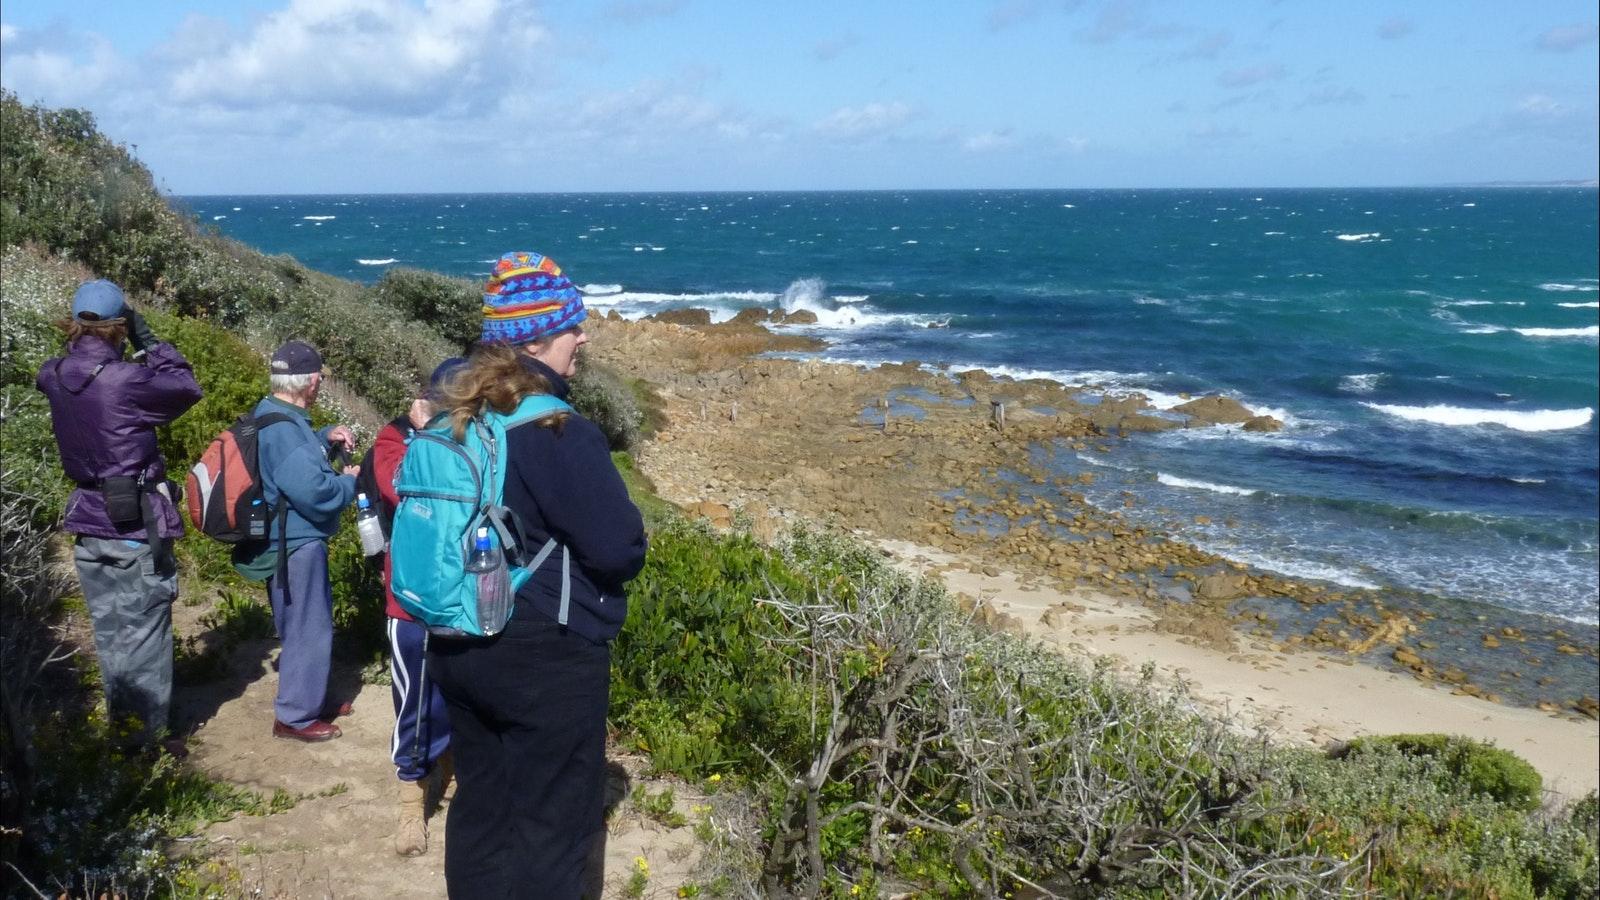 Croajingolong Coastal Eccotour - Small group and easy or moderate walks